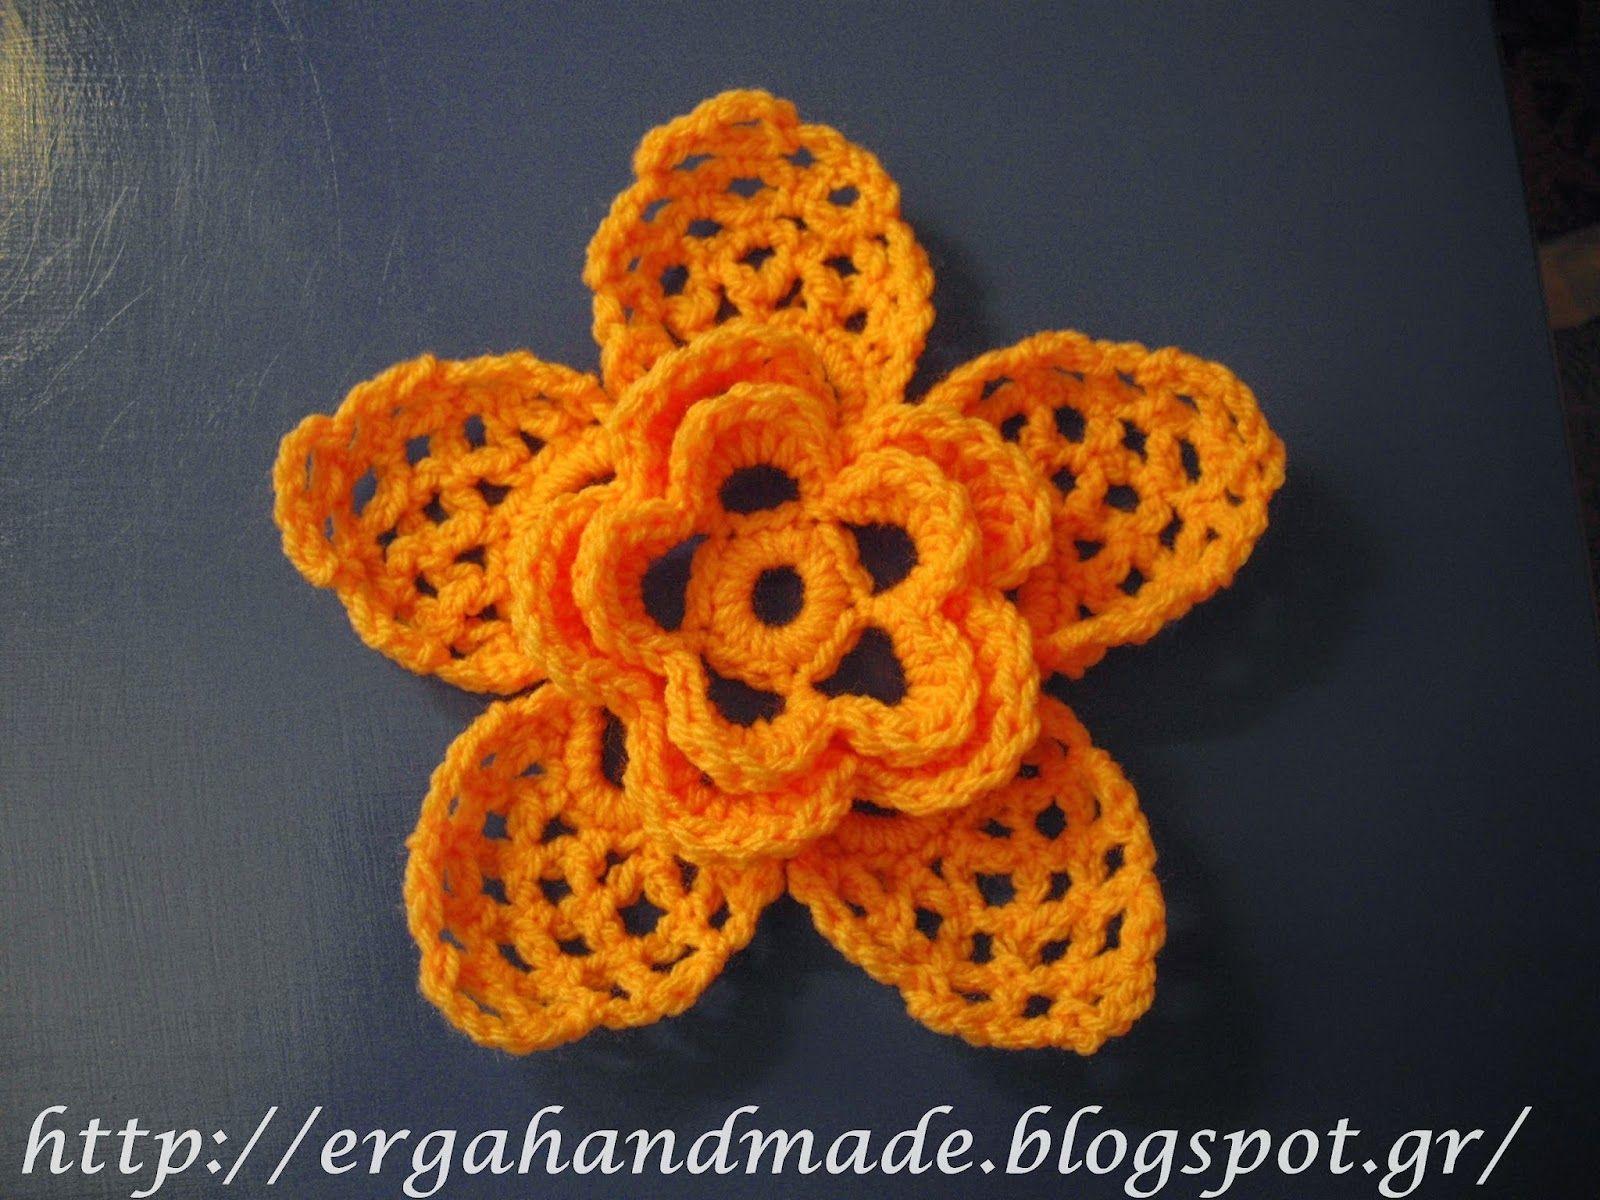 ergahandmade | Kwiaty | Pinterest | Flores ganchillo, Hoja y Ganchillo